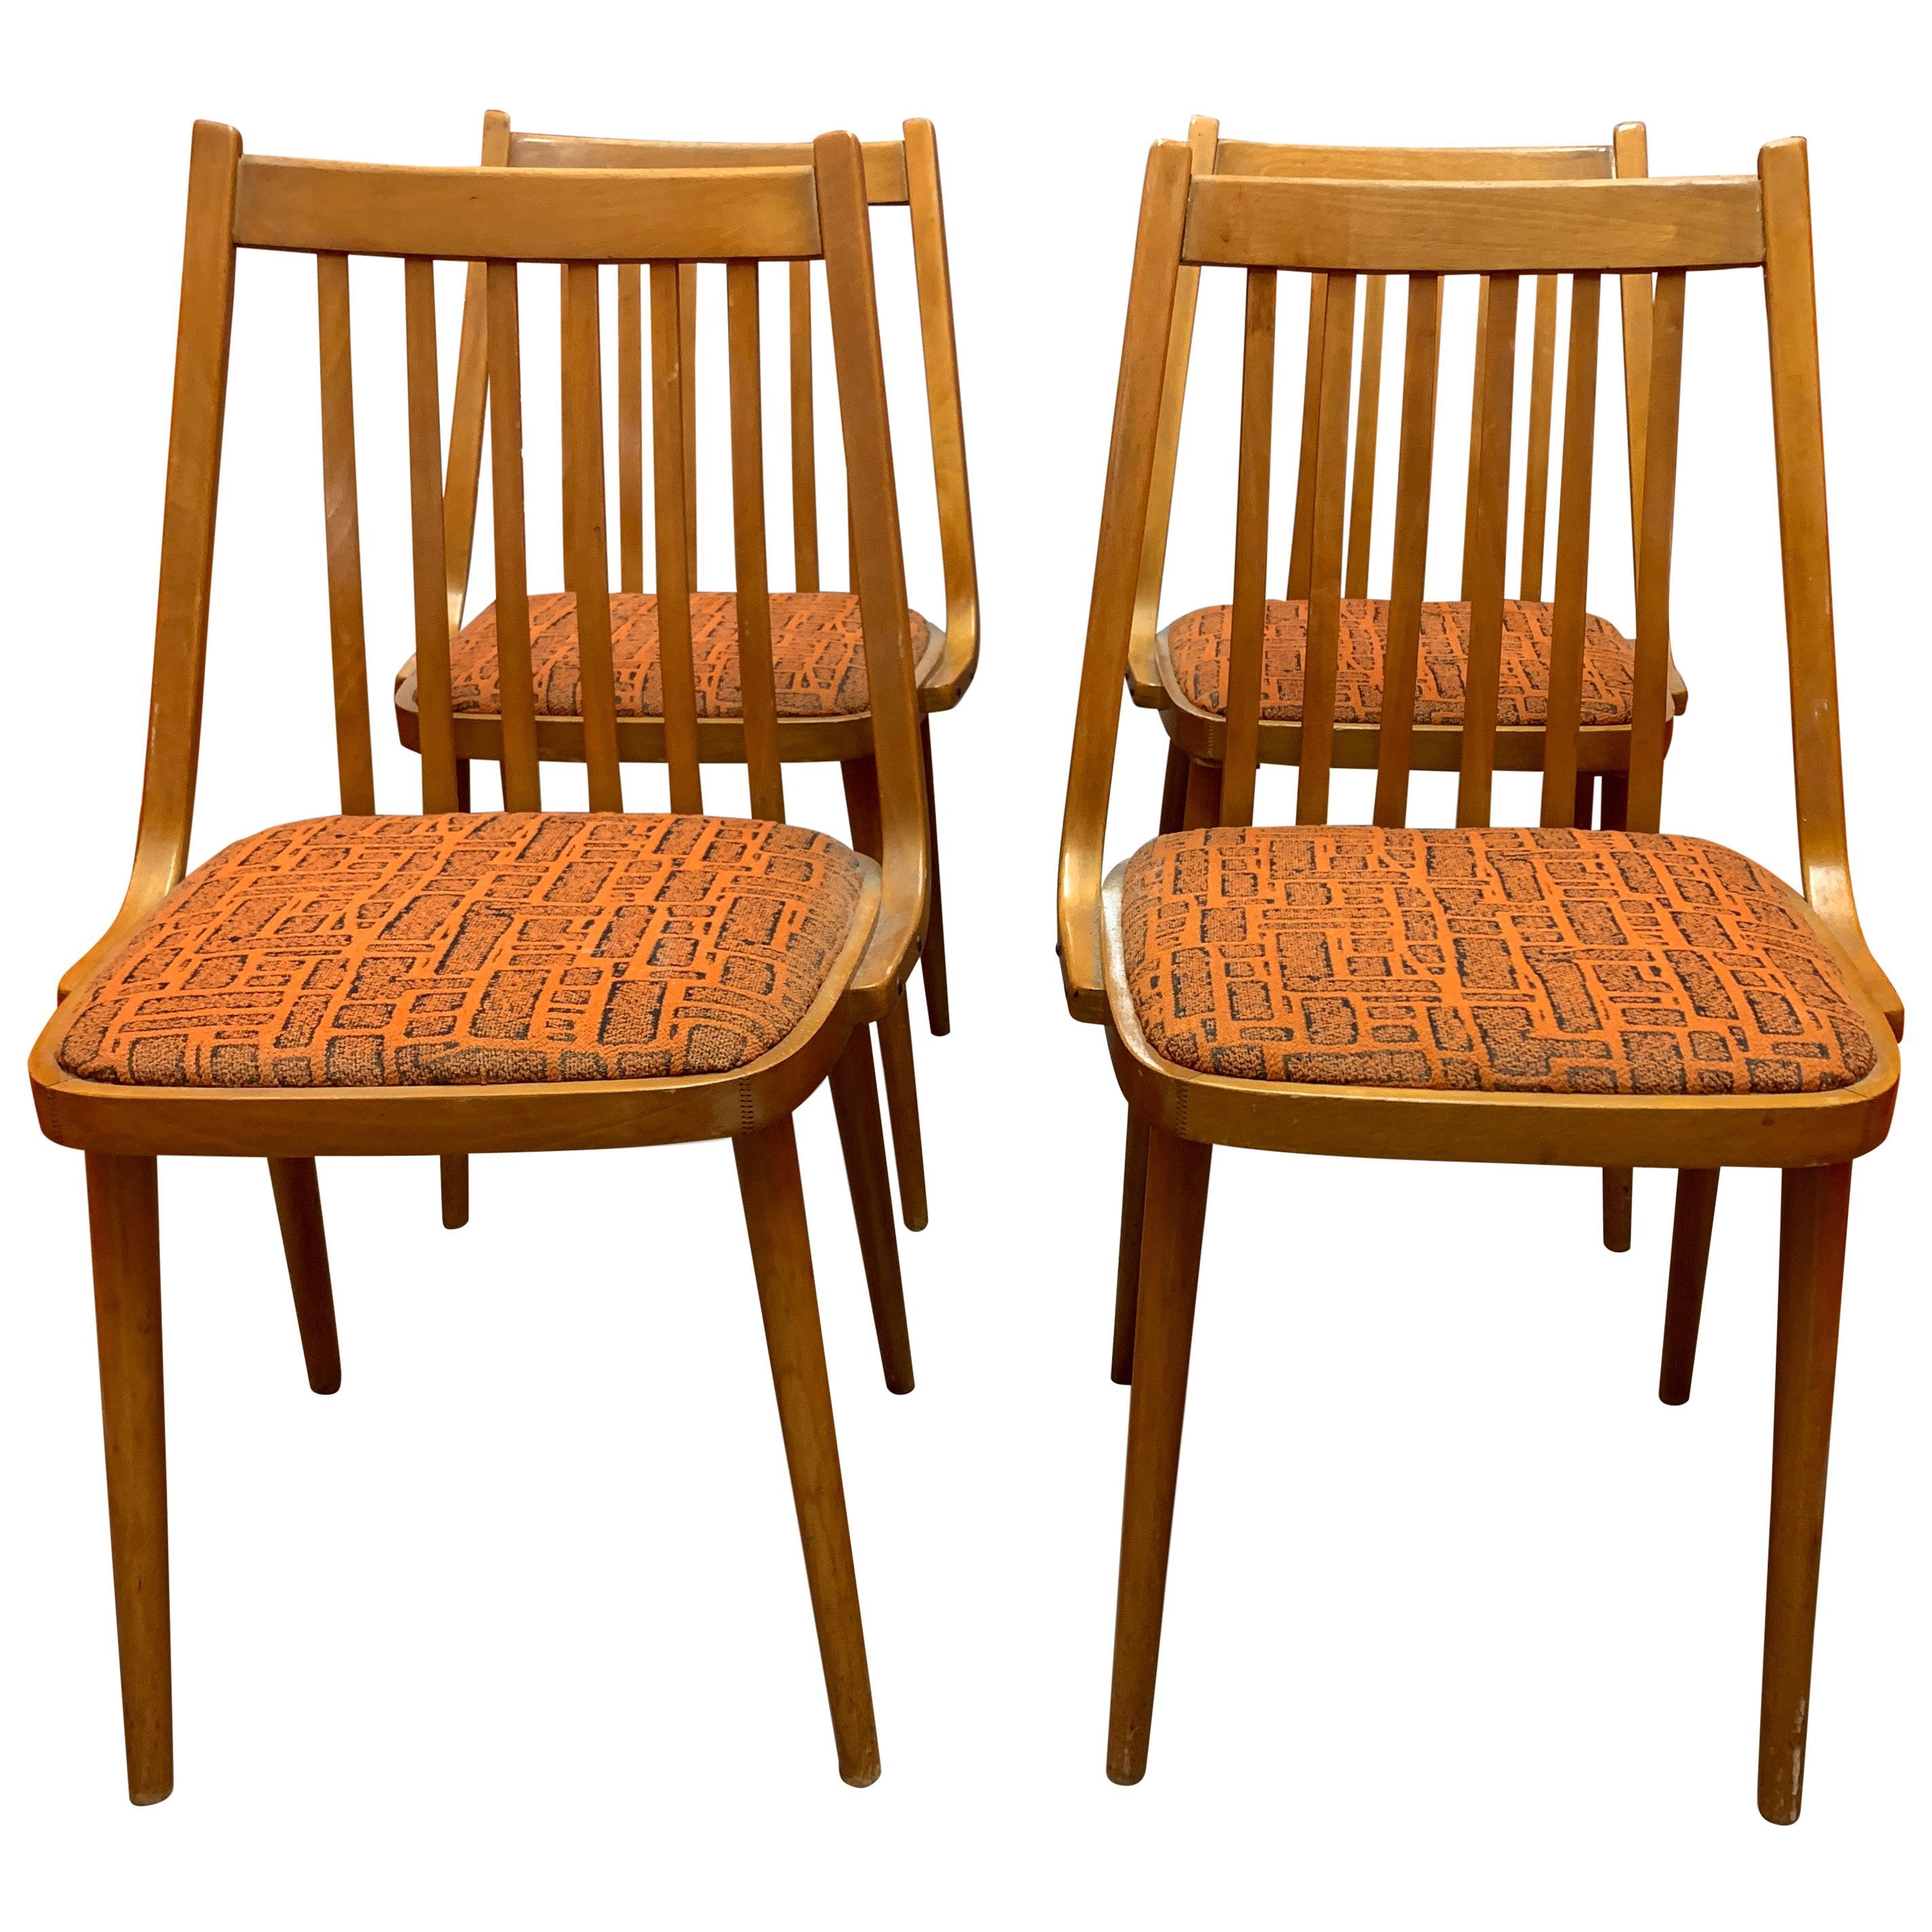 Set of 4 Midcentury Danish Dining Chairs